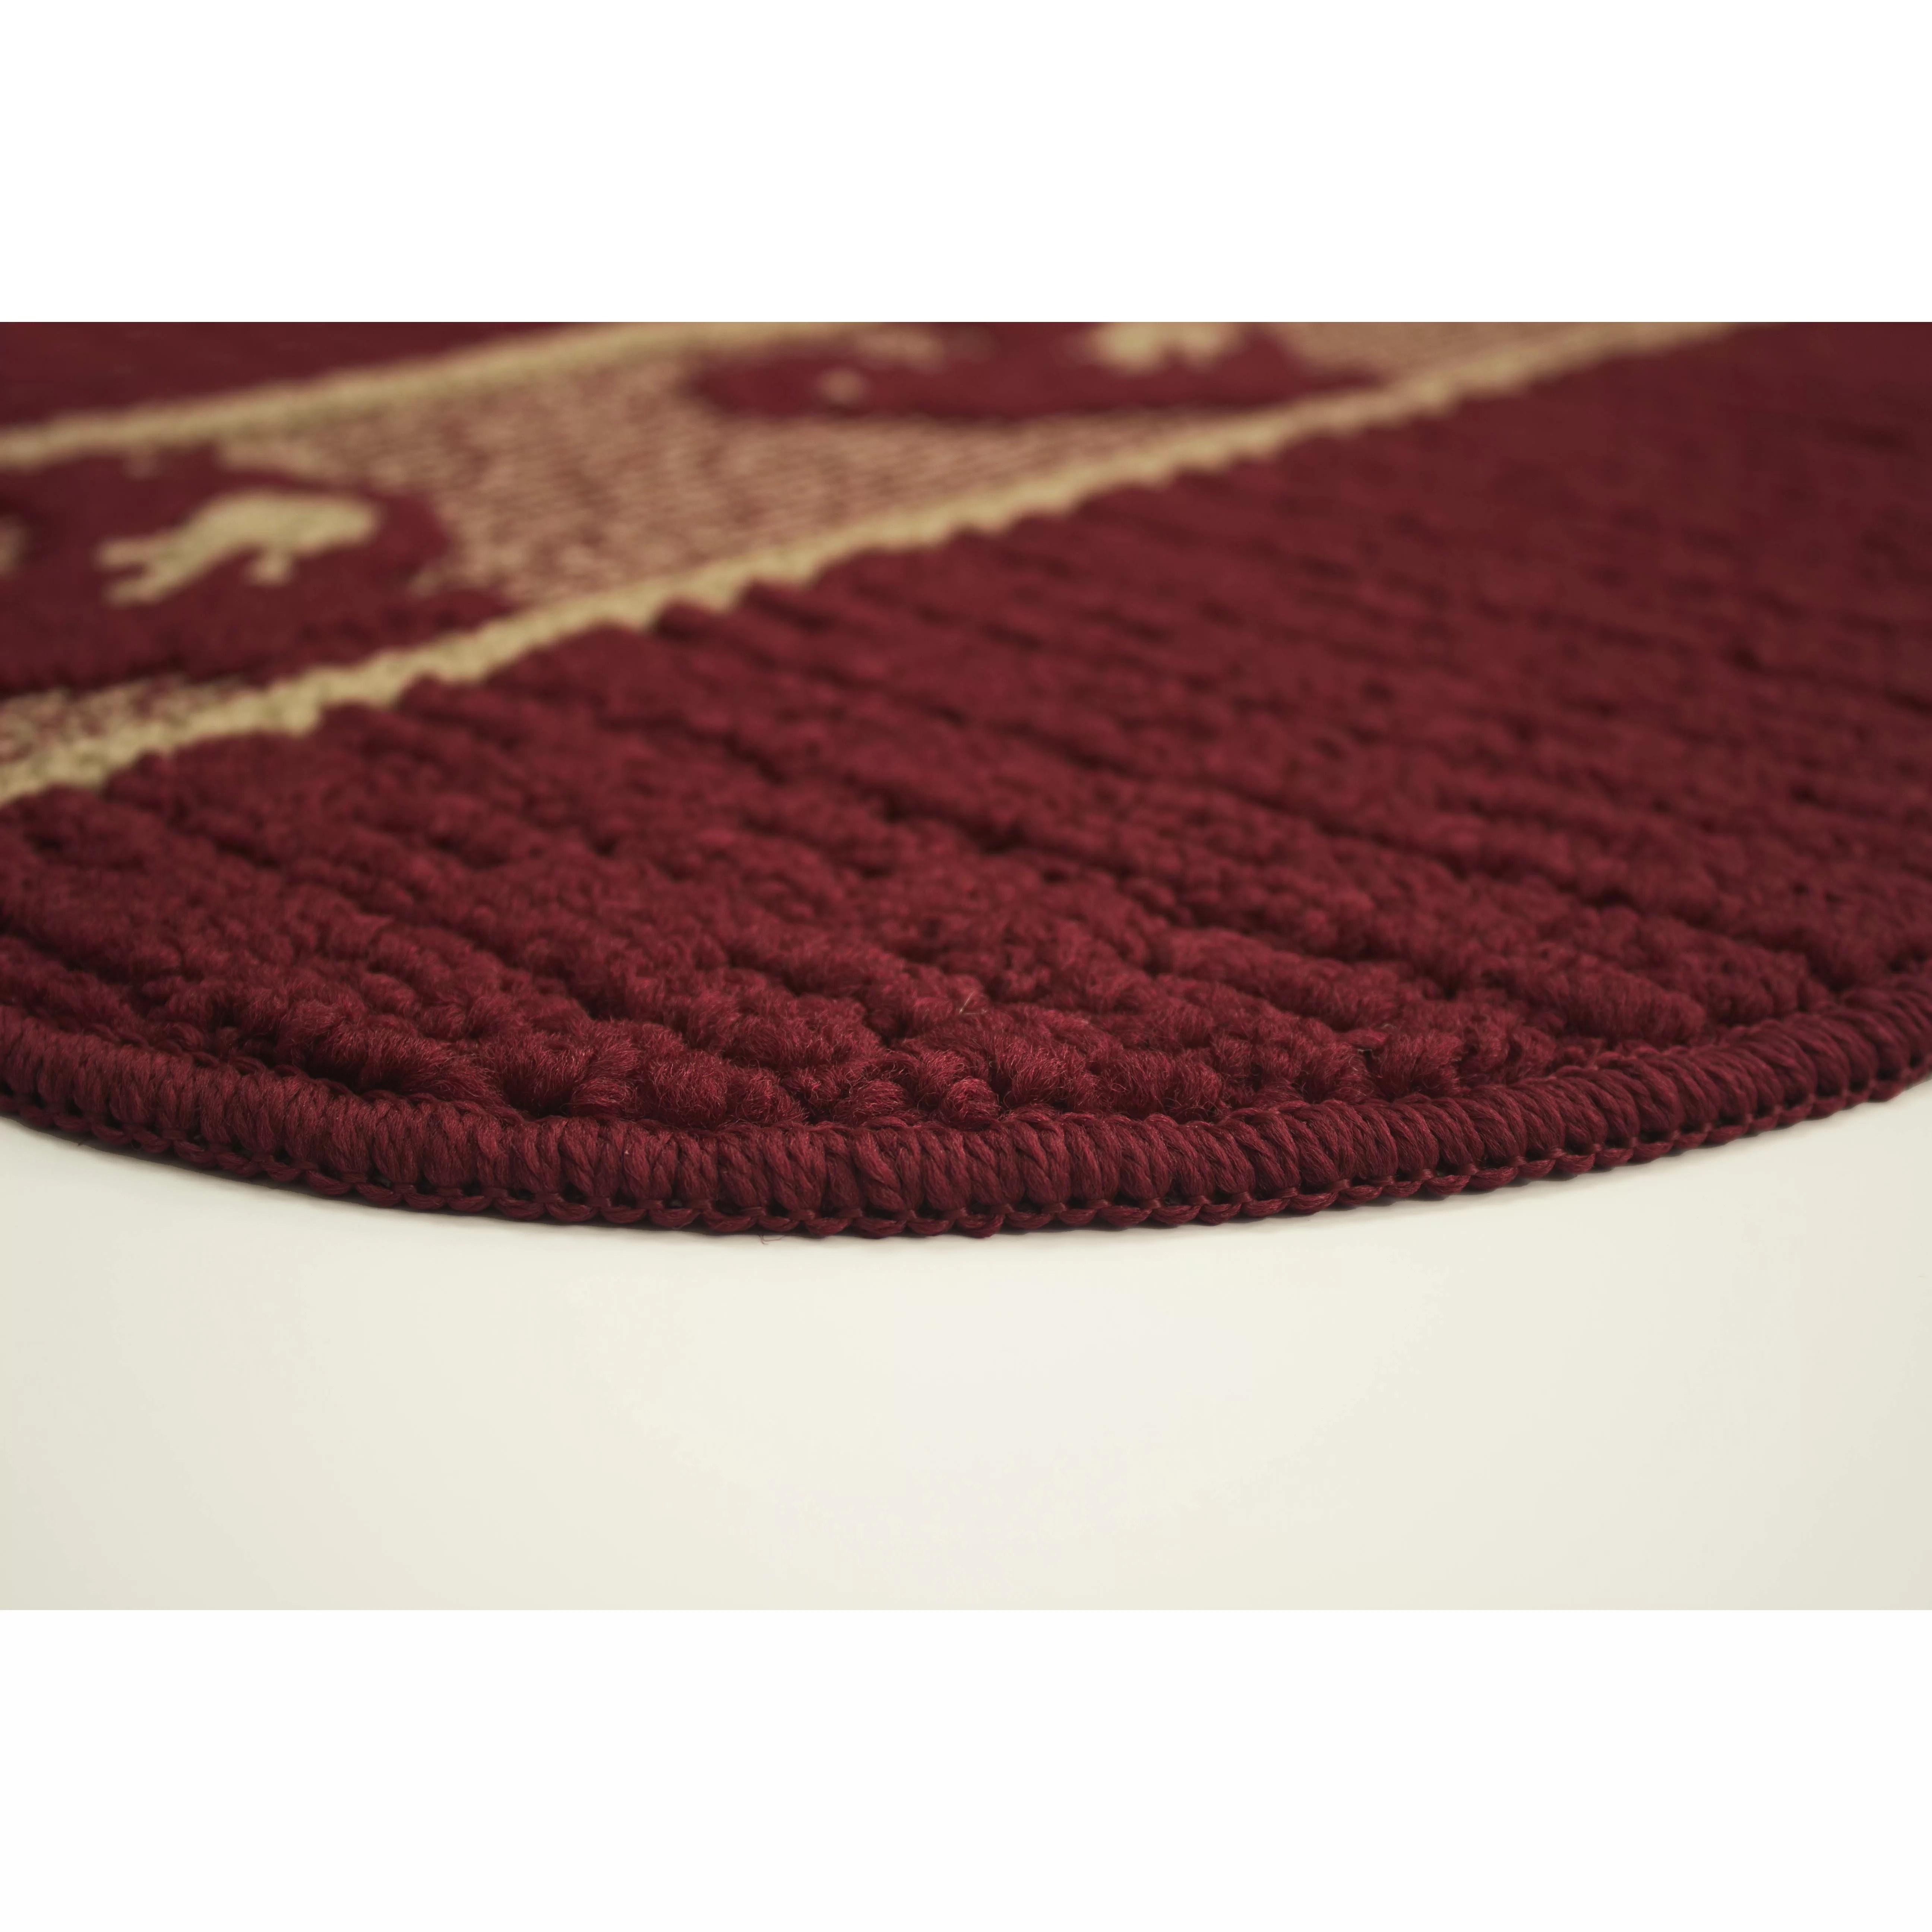 semi circle door mats c a~ decorative kitchen floor mats Structures Textured Loop Wedge Kitchen Mat